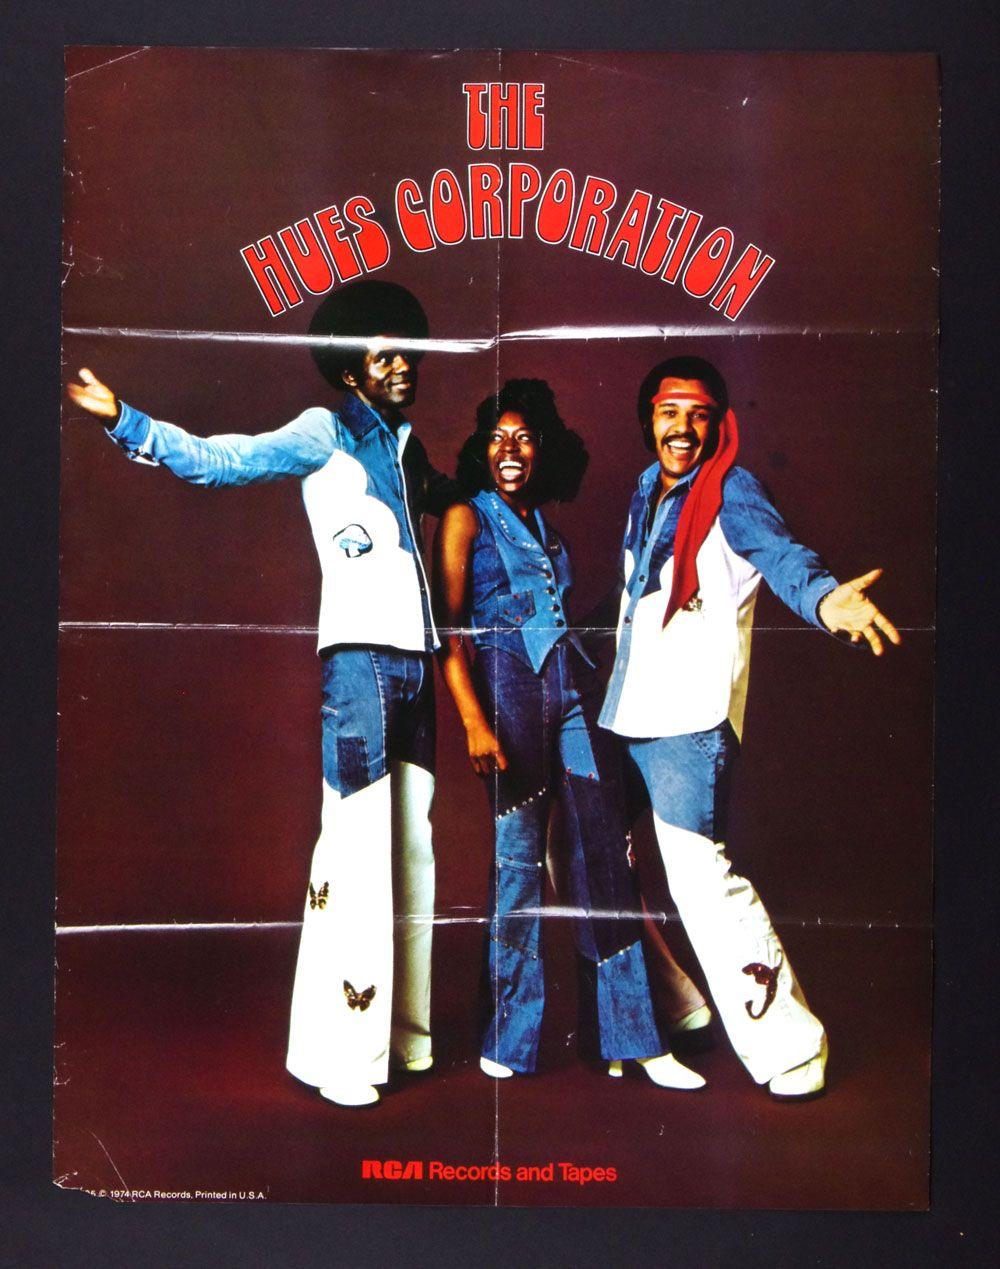 The Hues Corporation Poster Rockin Soul 1974 Album Promo 22 X 29